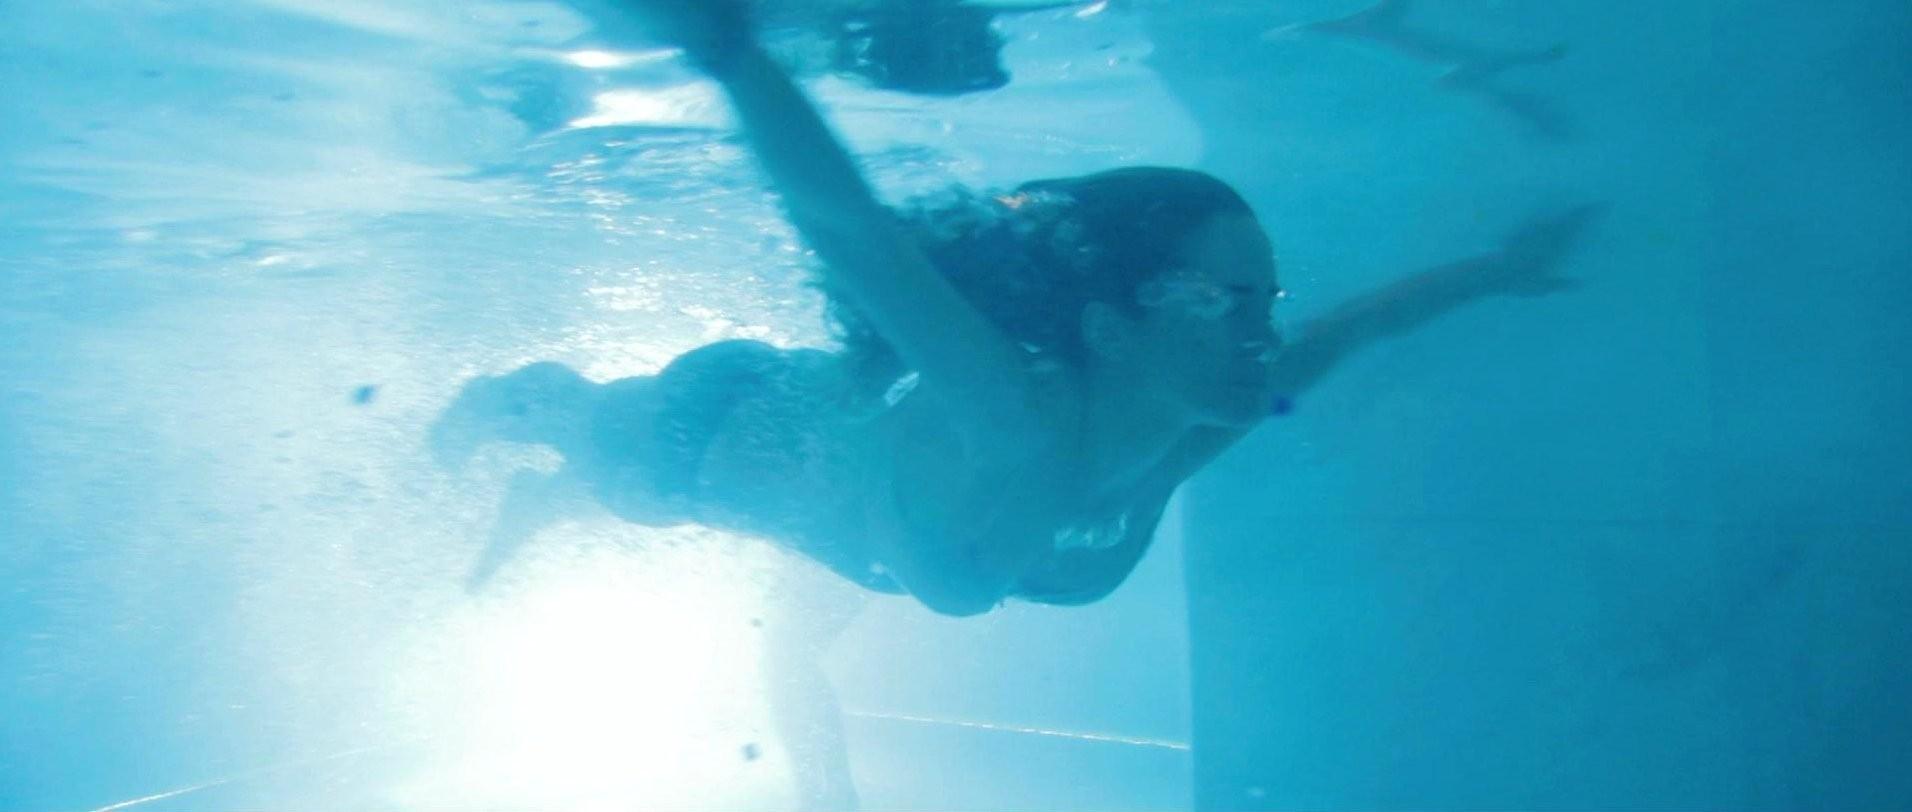 xxx videos de Alicia Sanz sin ropa interior